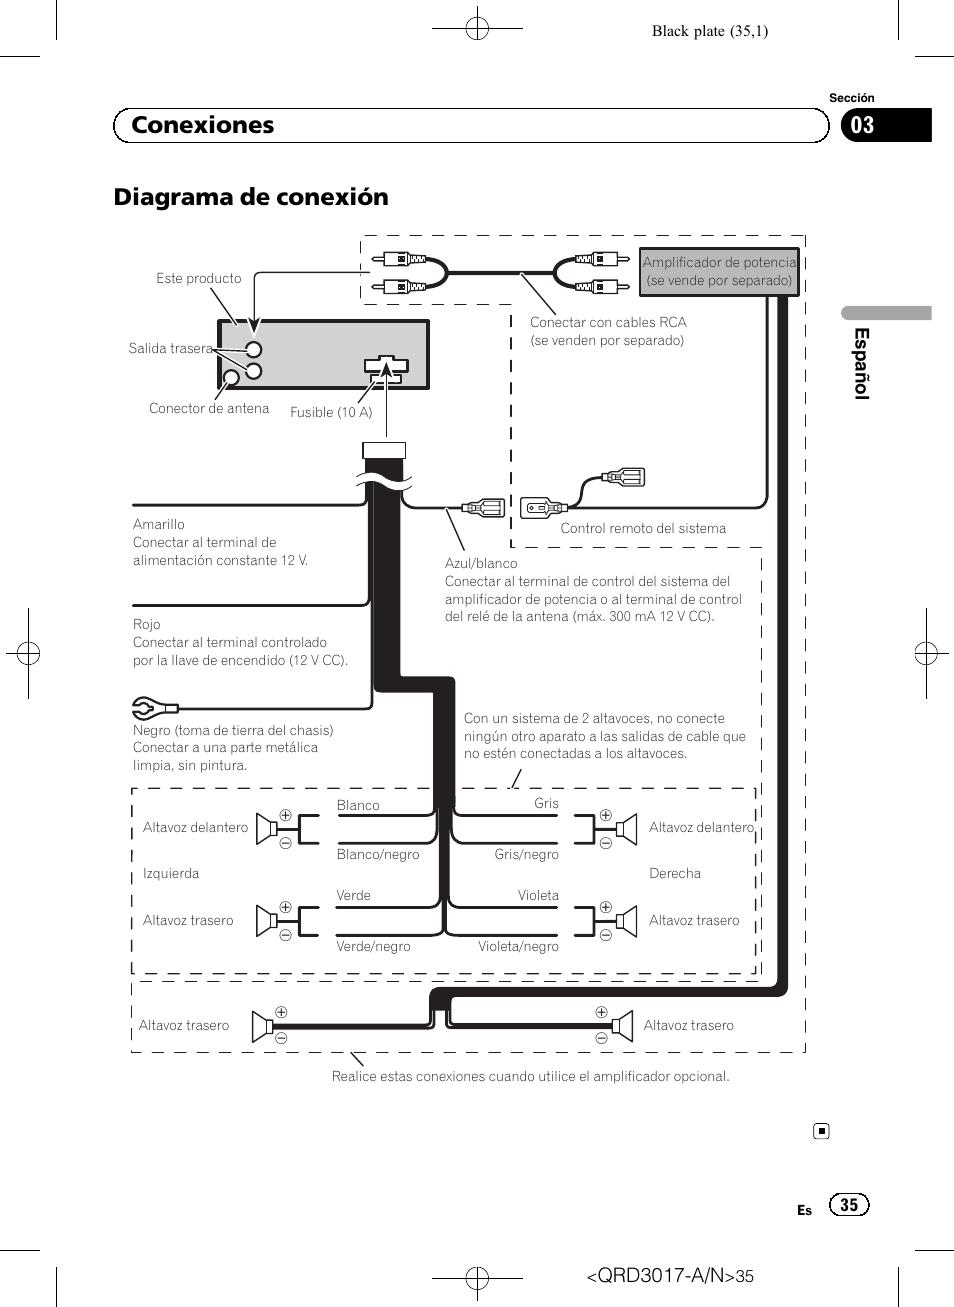 Marvelous Pioneer Deh P430 Wiring-diagram Pictures - Best Image ...